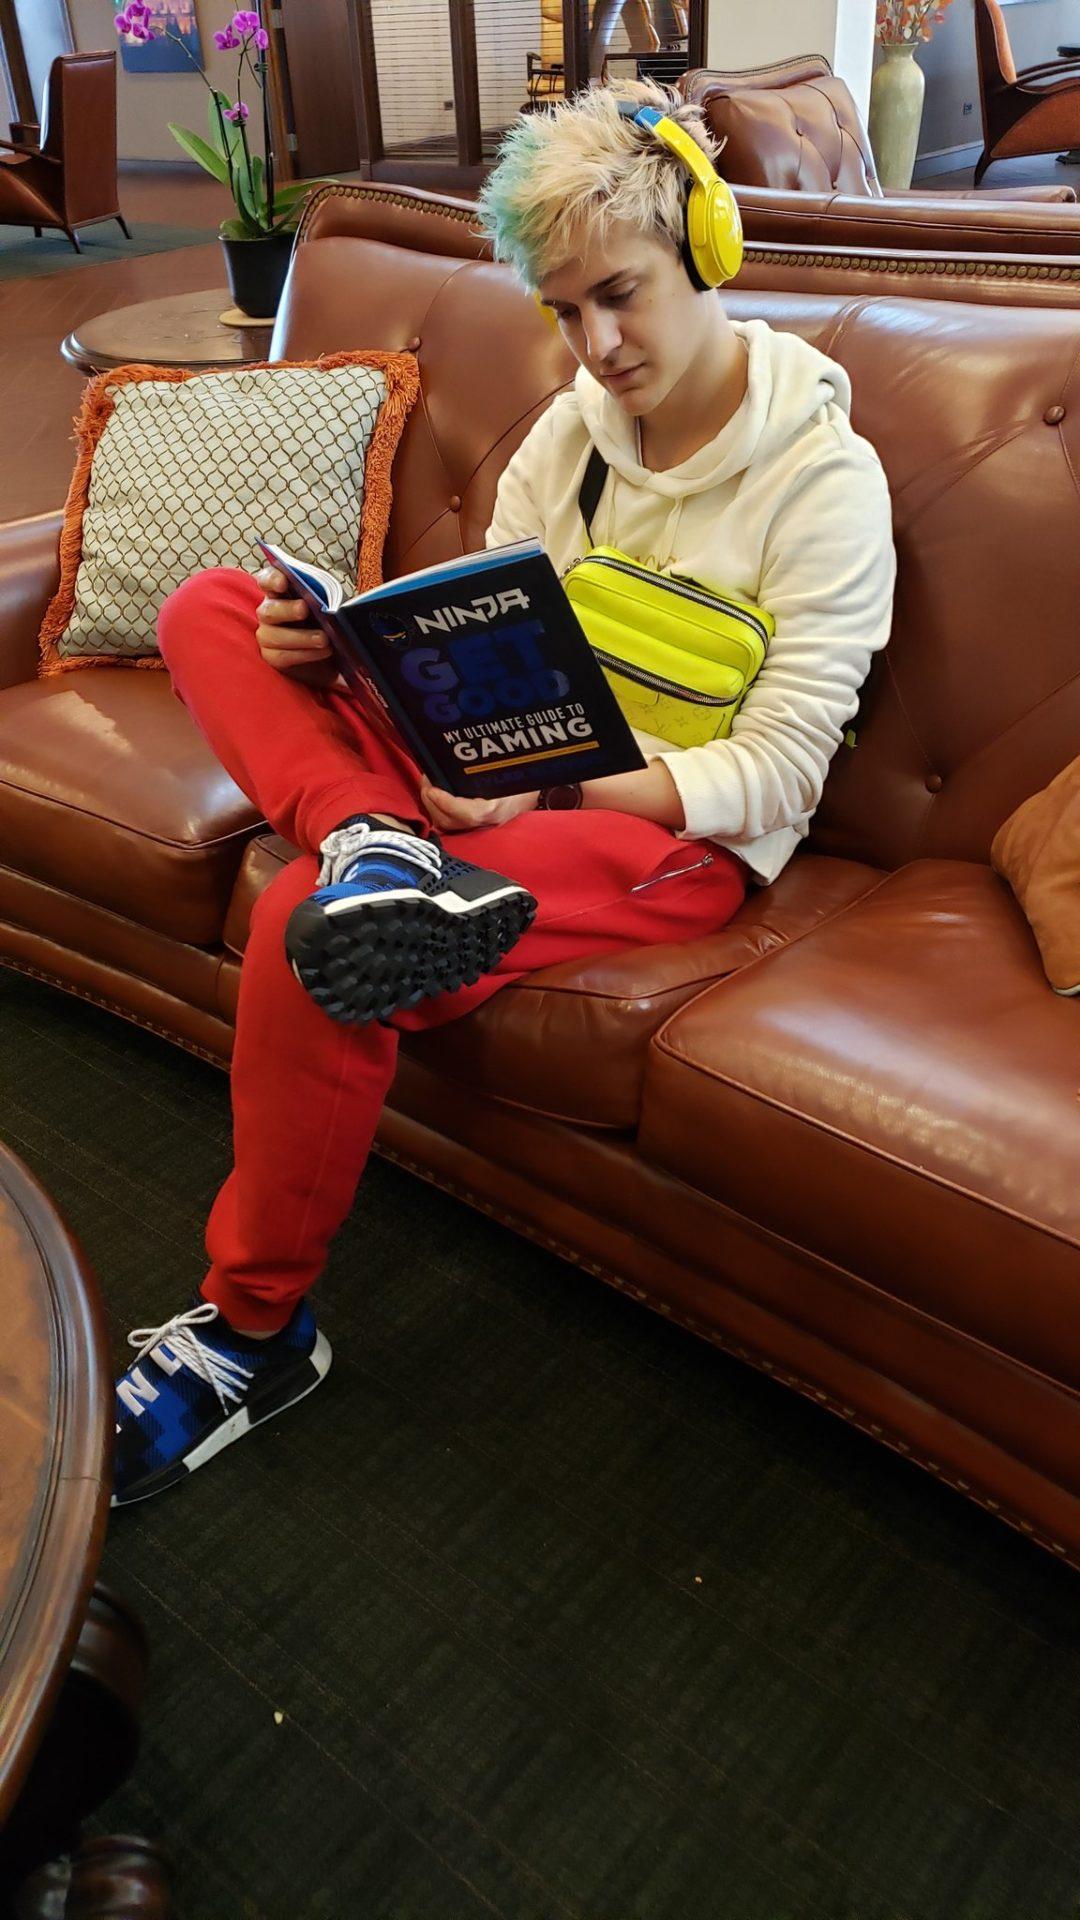 Ninja reads a book